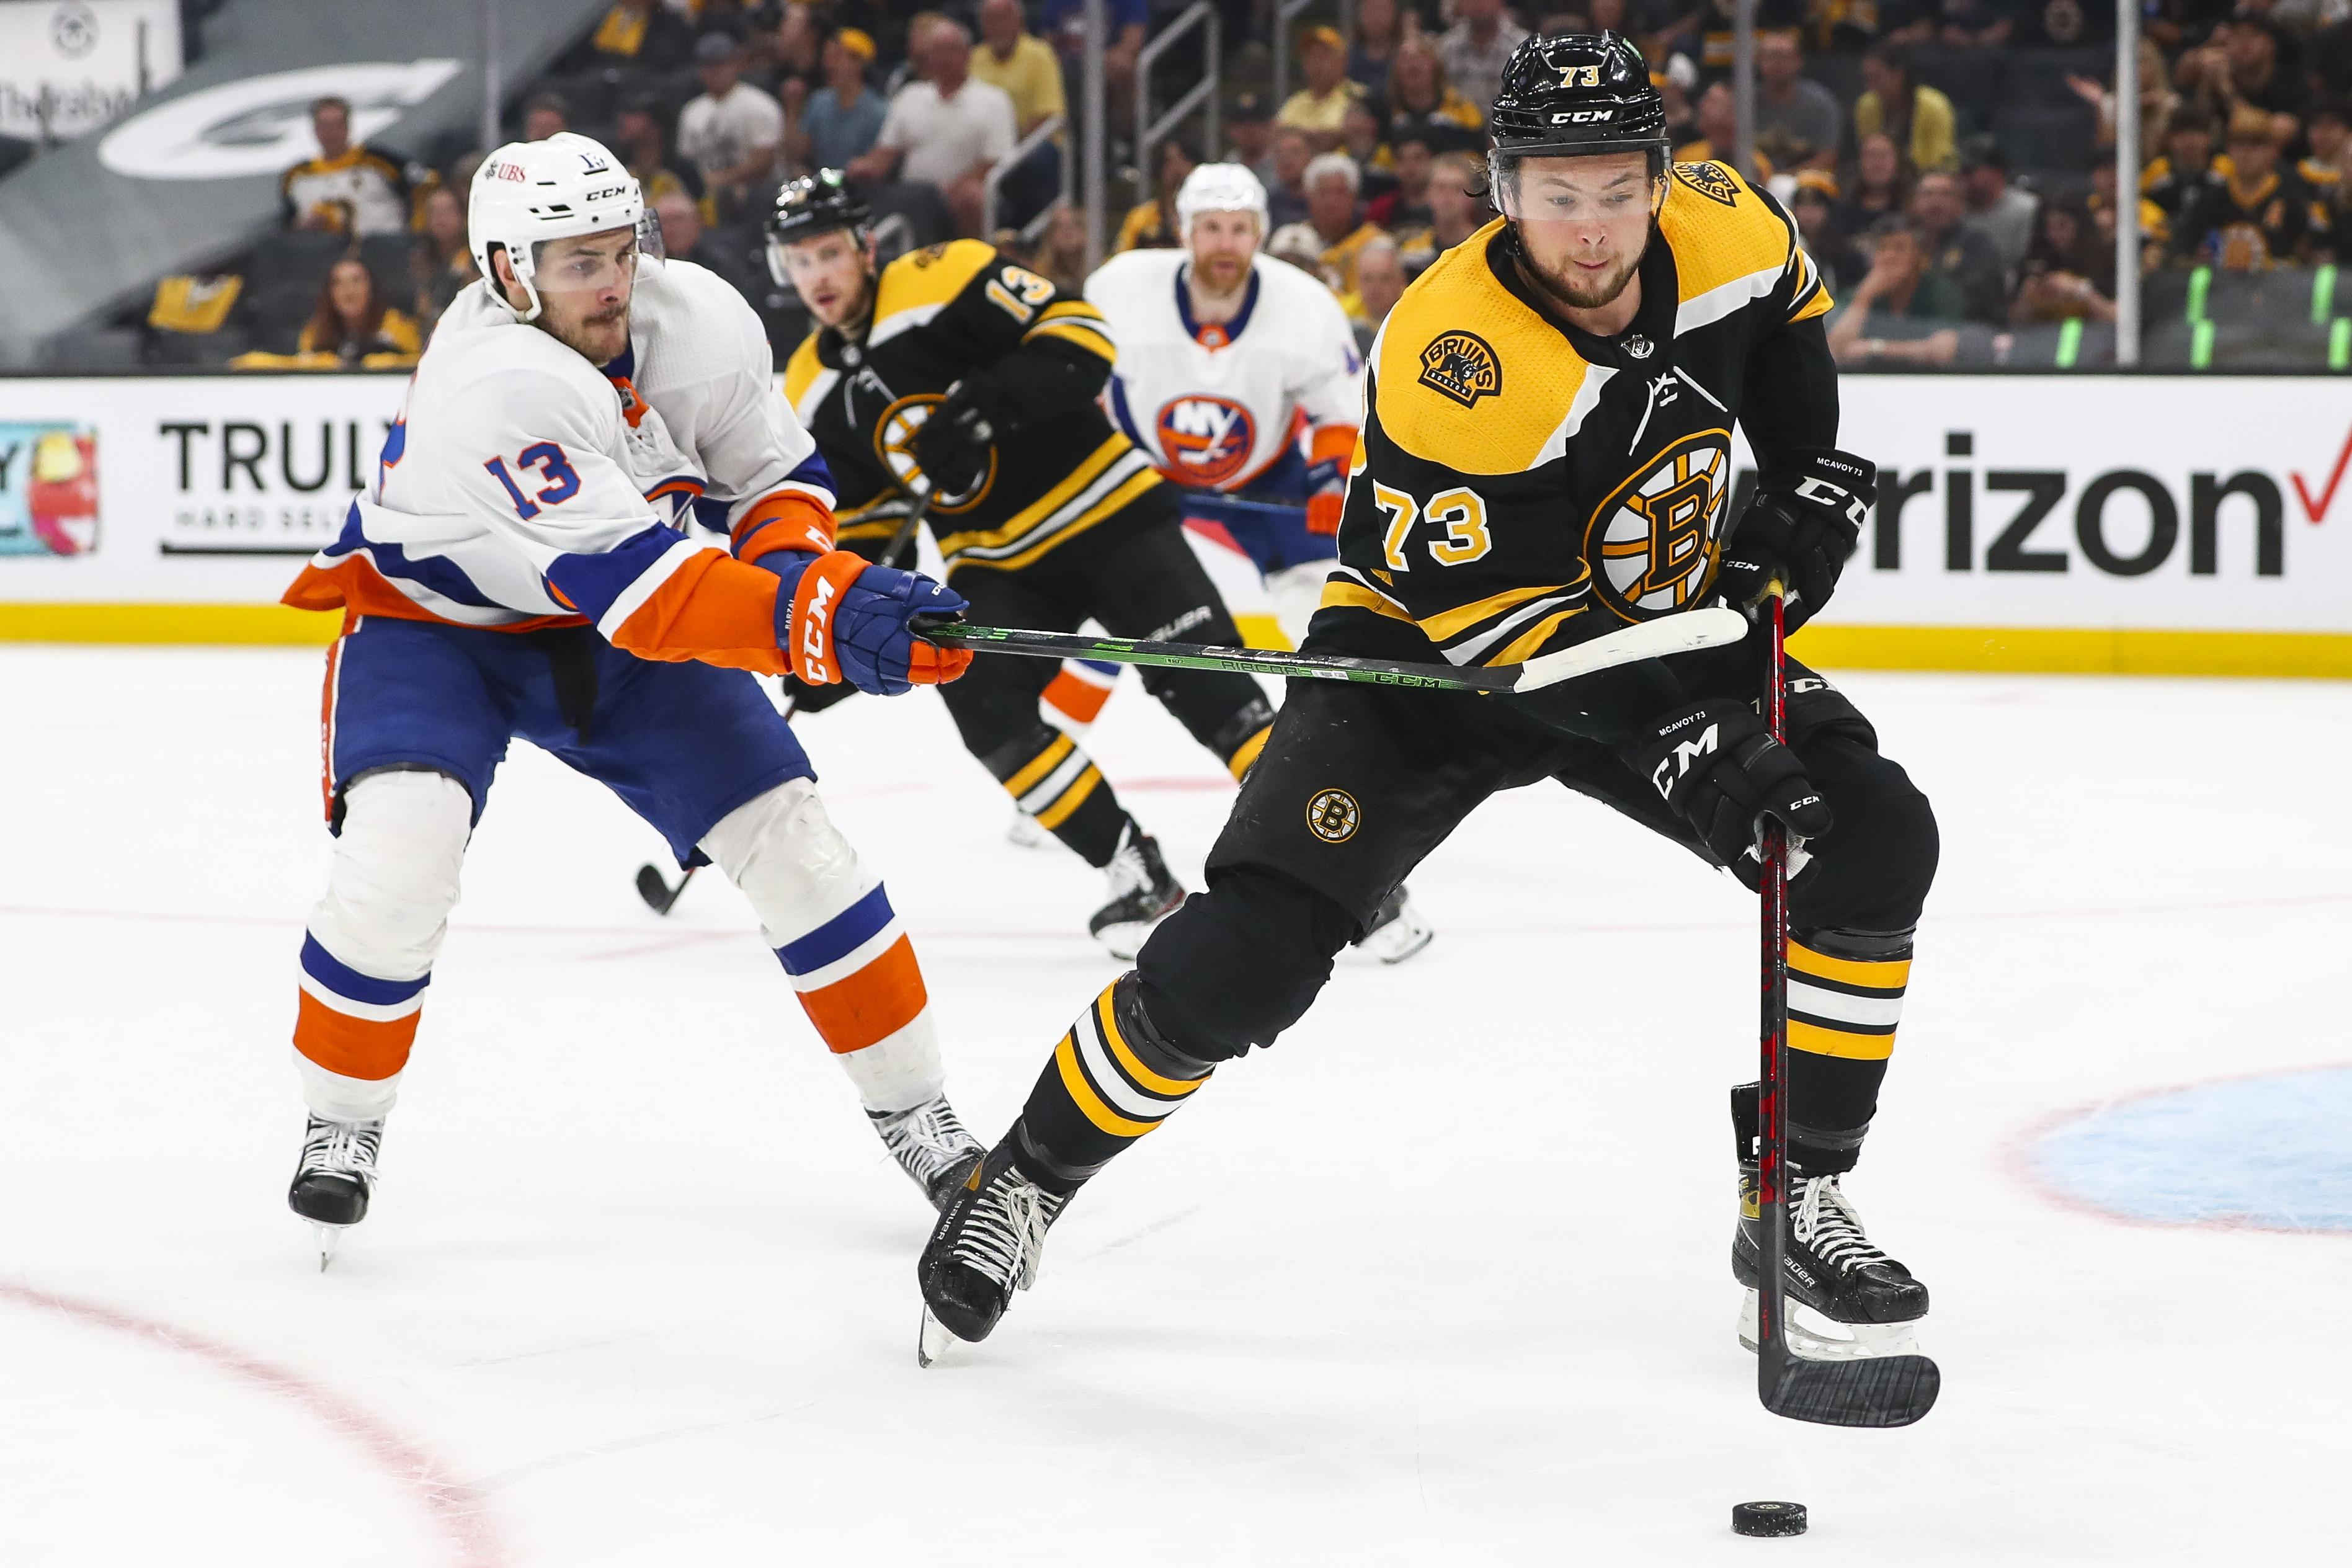 Islanders Chase Tuukka Rask, Win Game 5 to Take 3-2 Series Lead vs. Bruins thumbnail